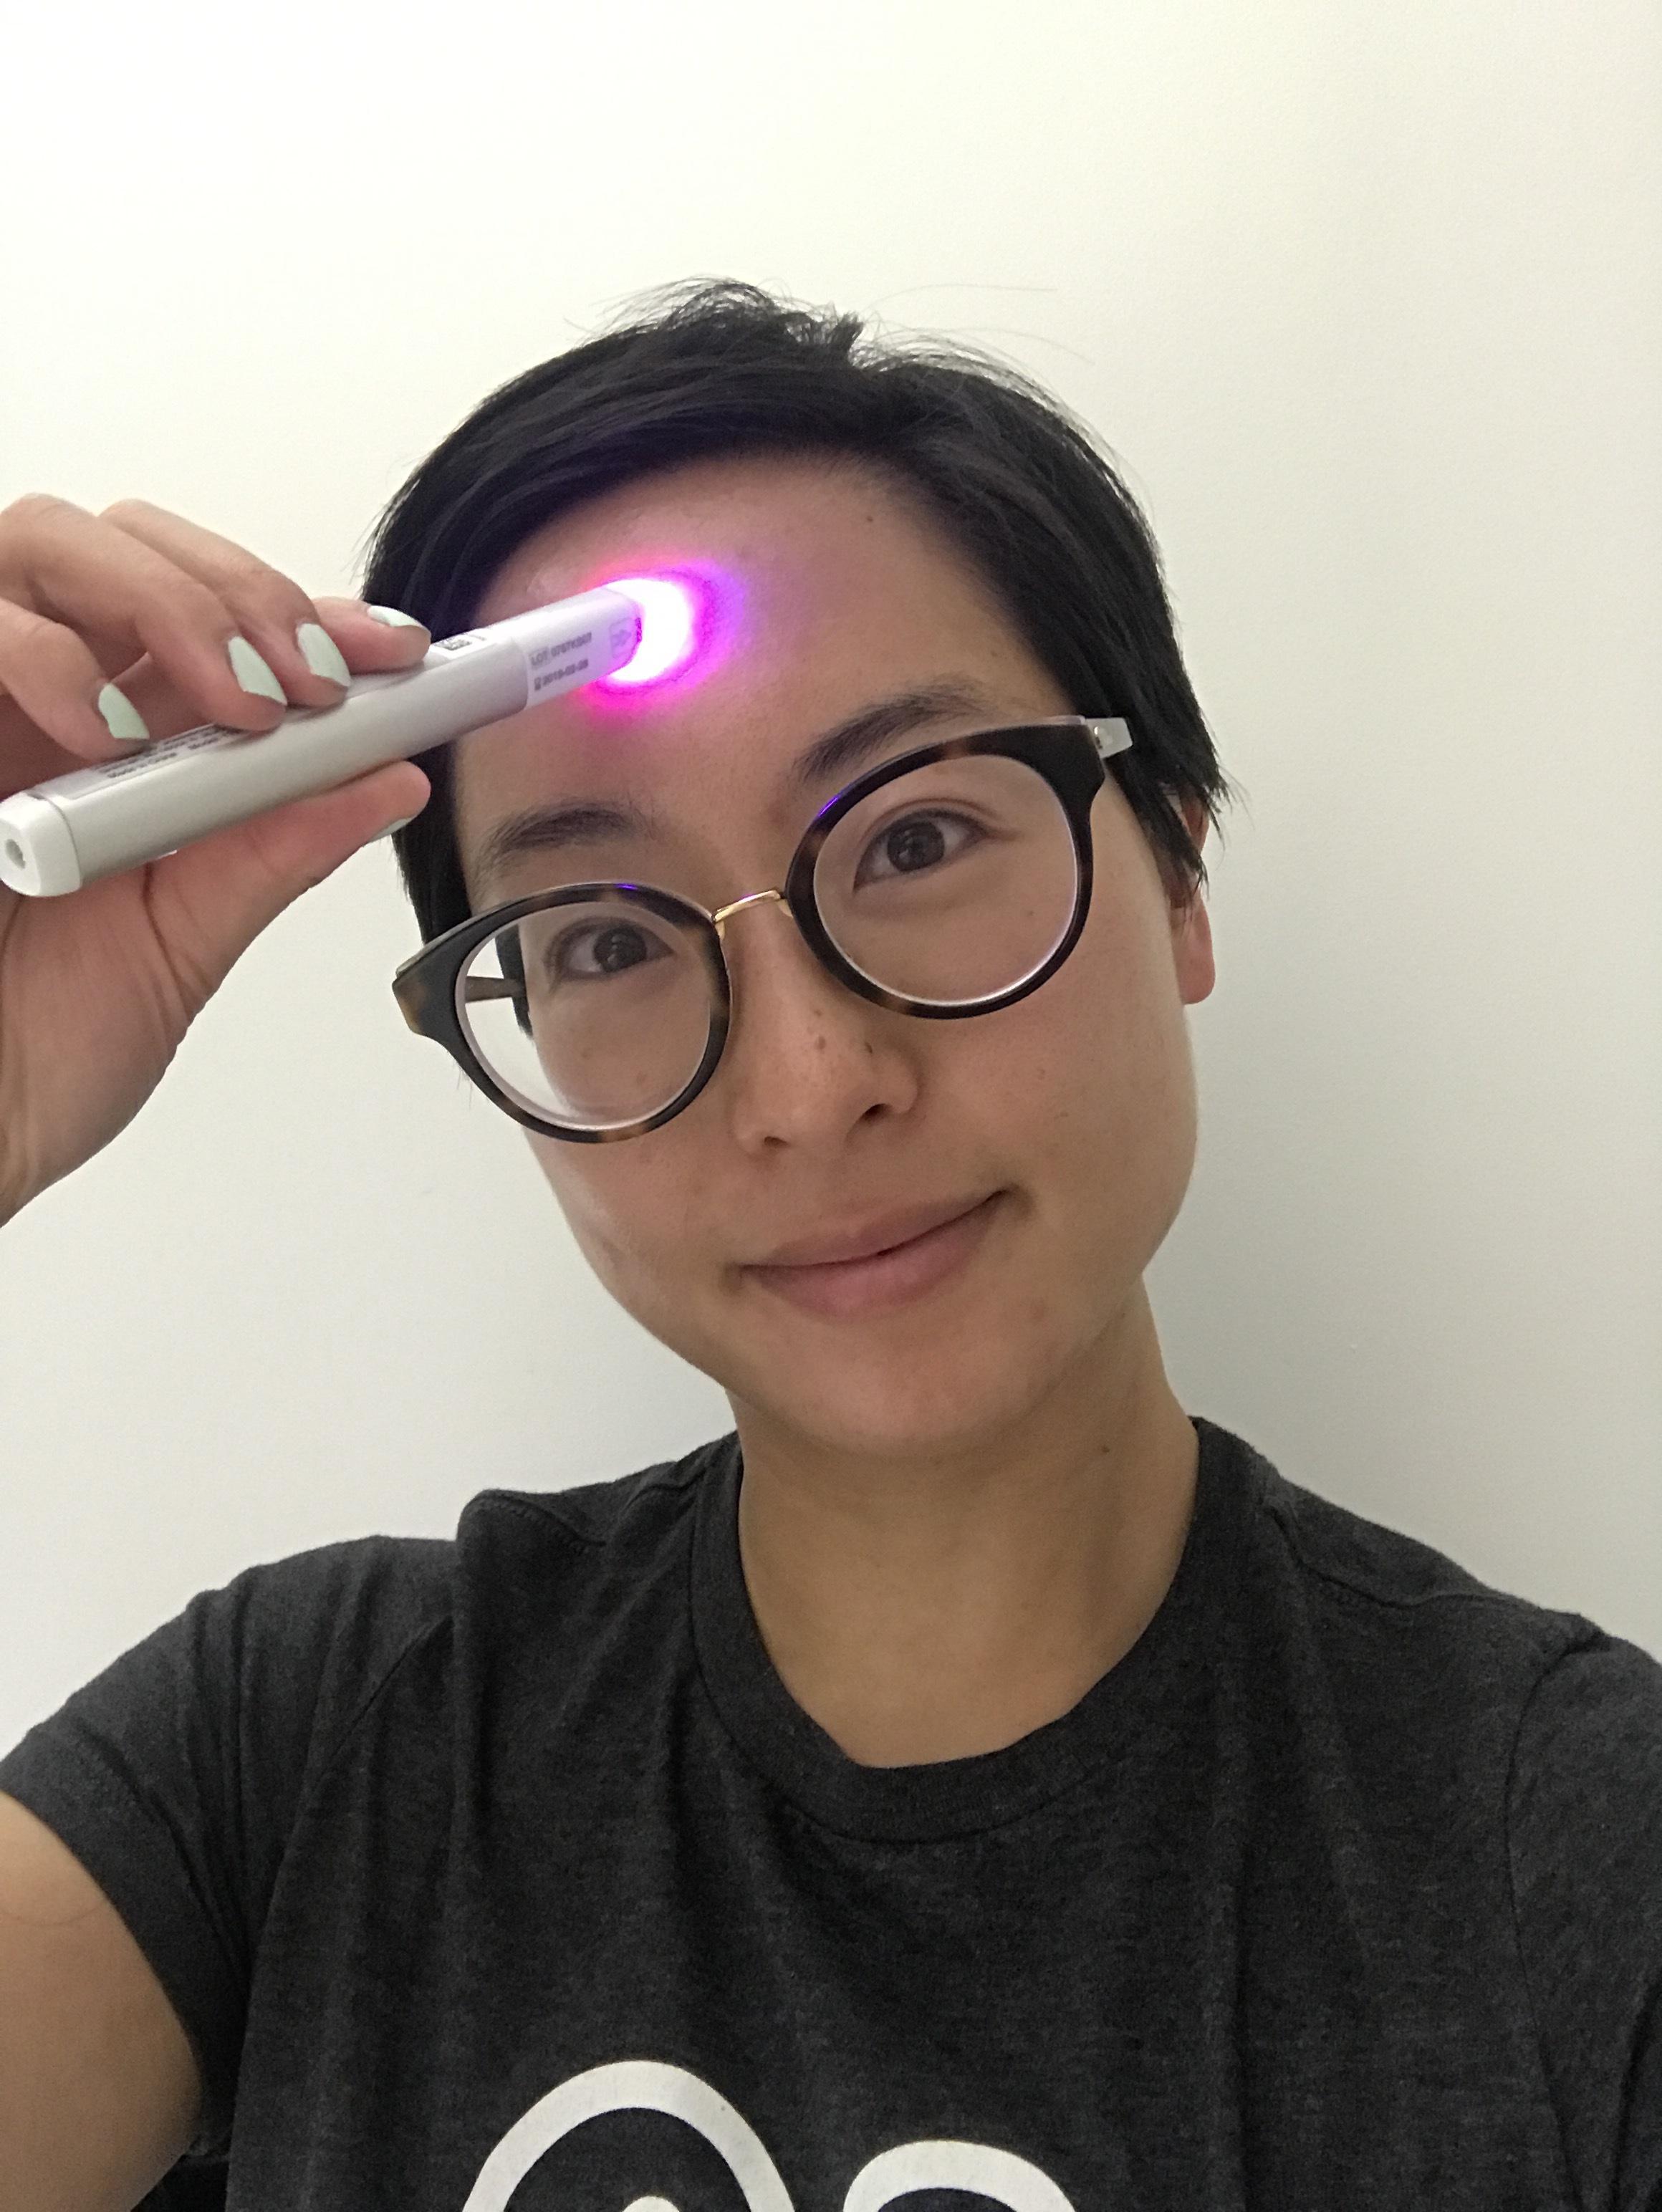 Foreo Espada Neutrogena Light Therapy Acne Spot Treatment Comparison Review Mask Addict